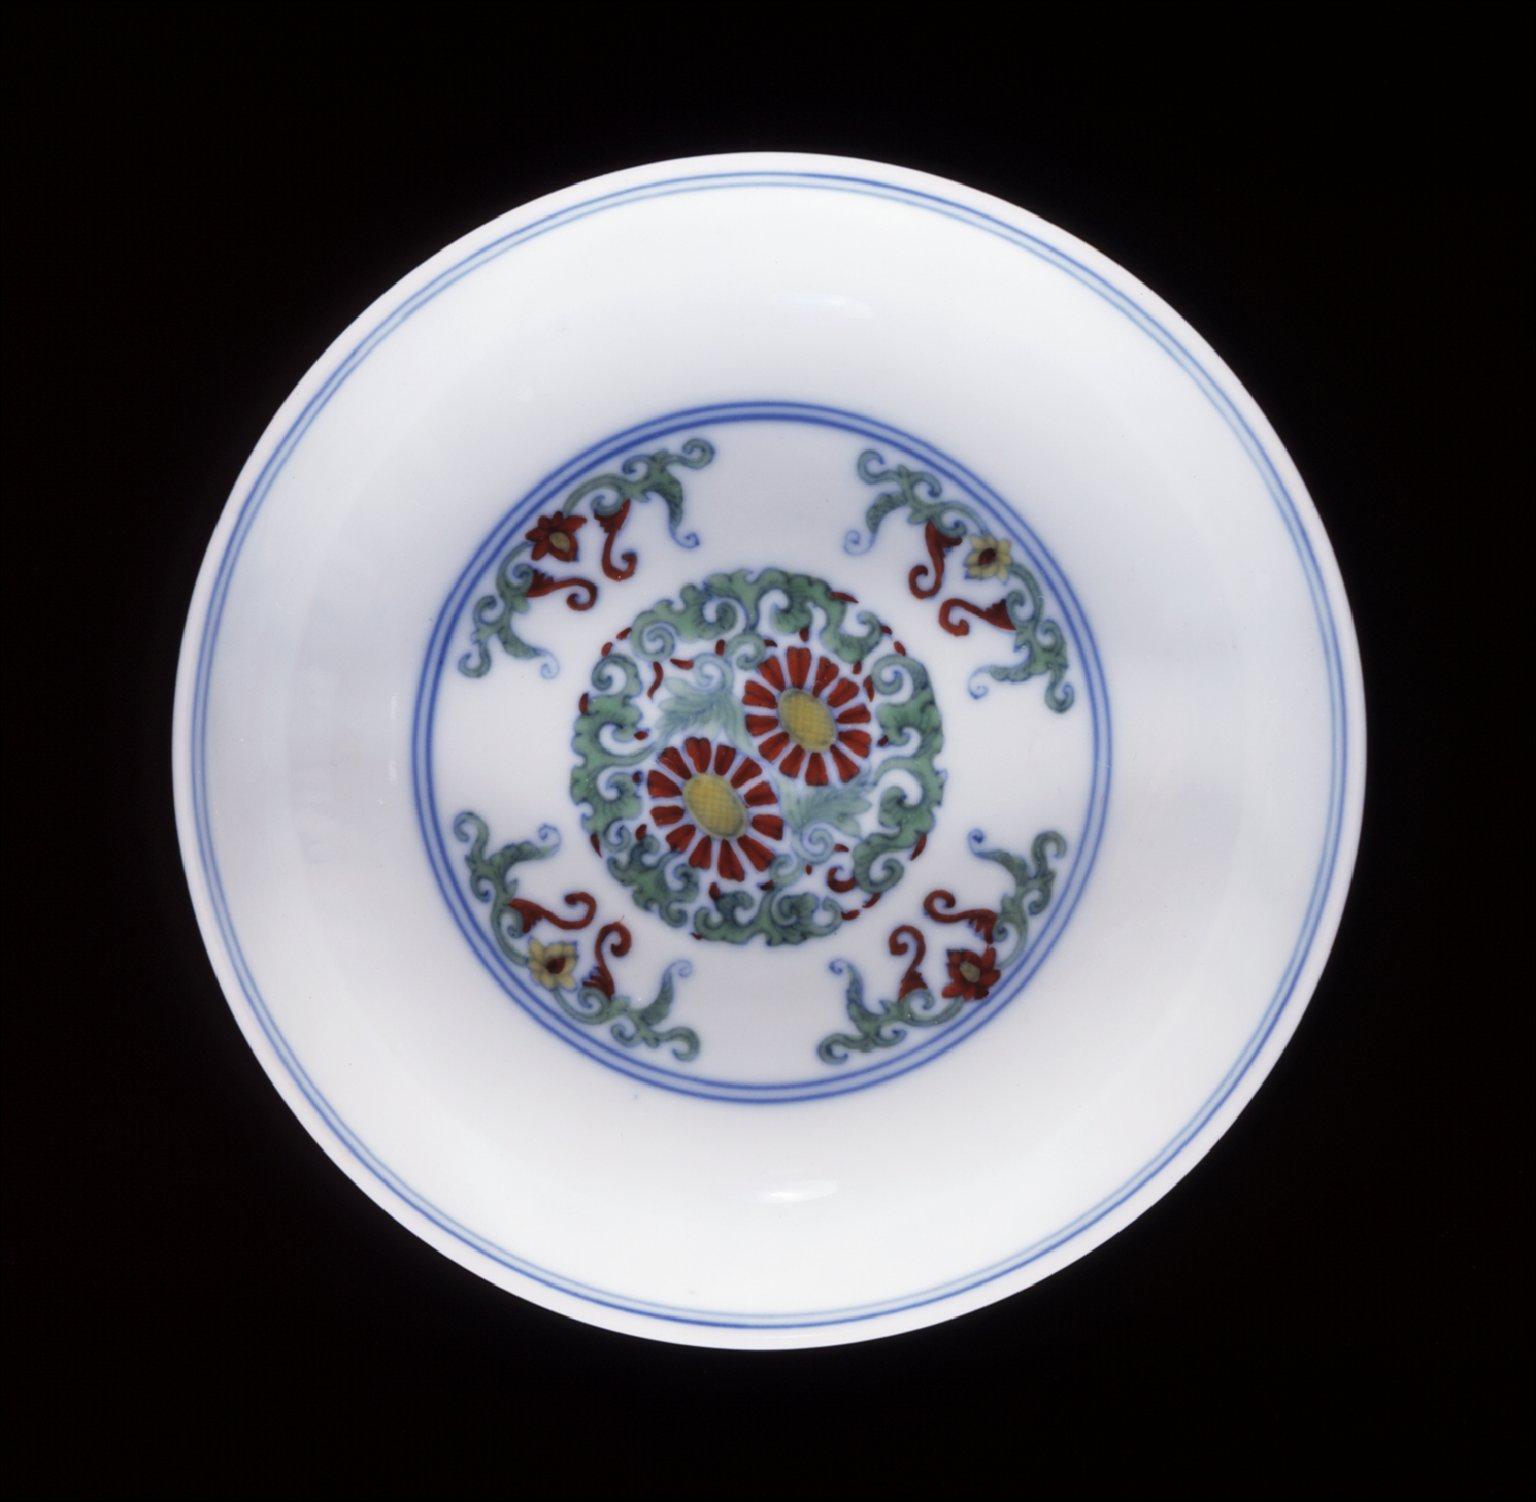 Pair of Dishes (Die) with Chrysanthemum Scrolls